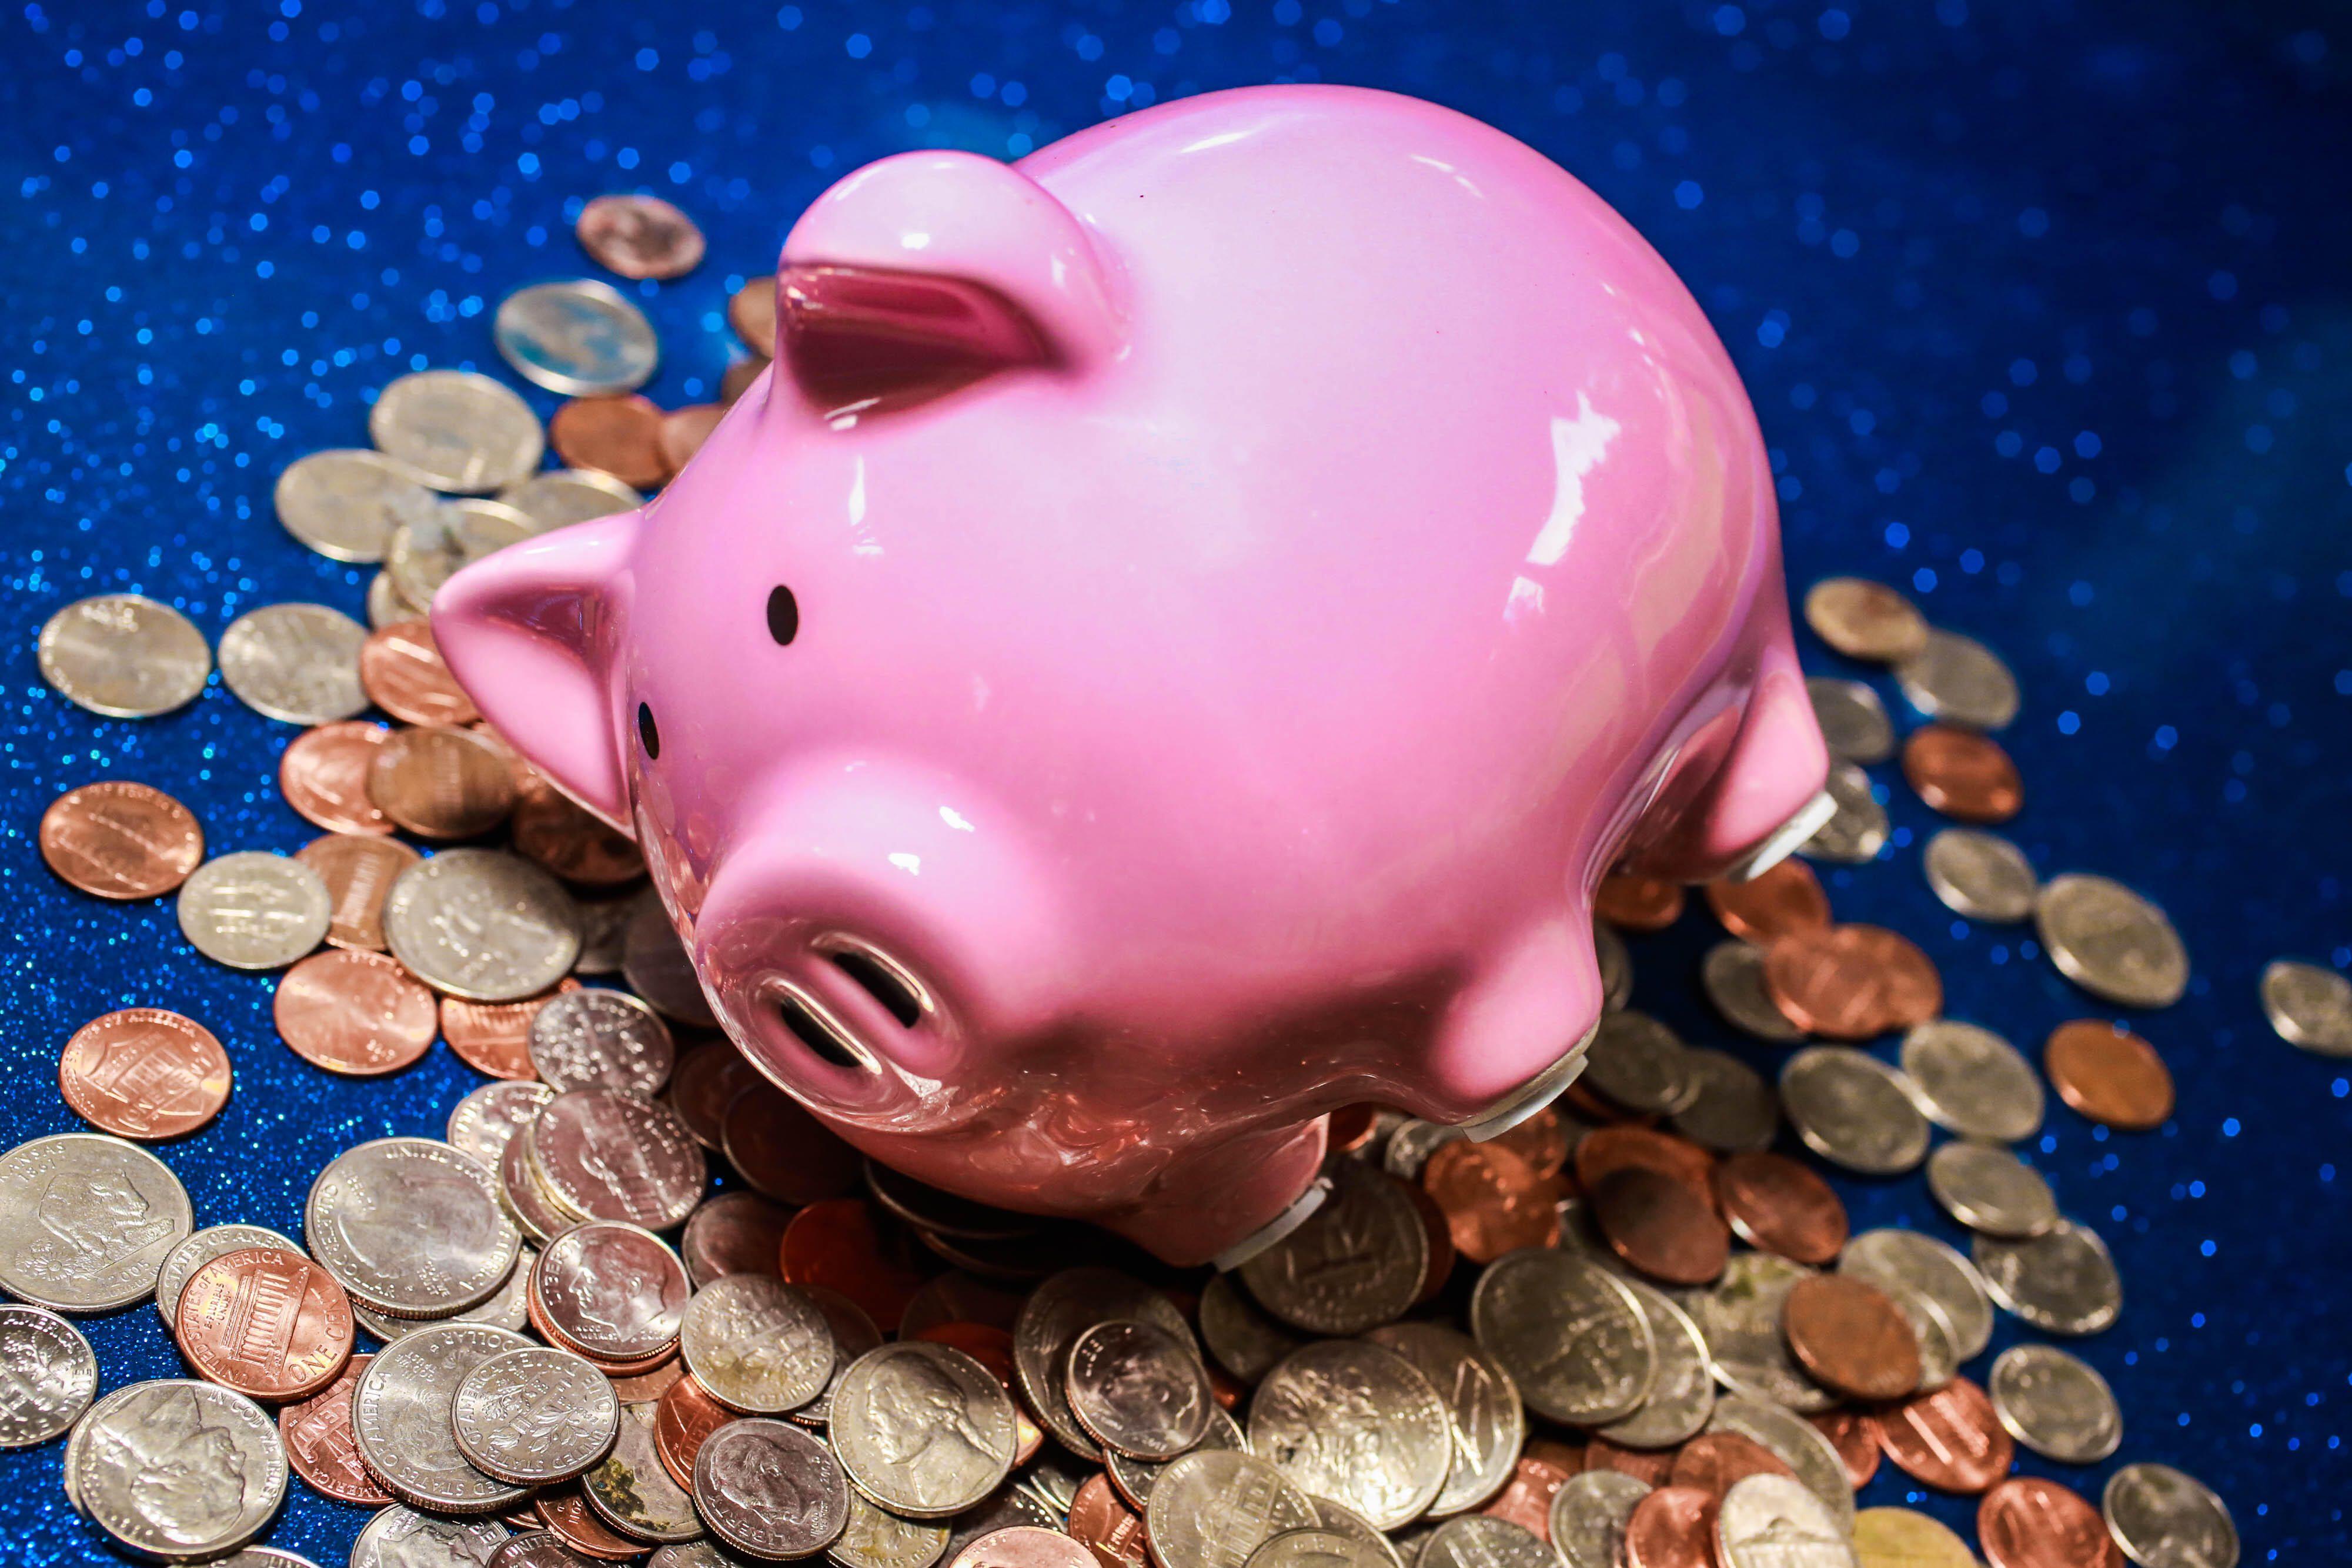 breaking-the-piggy-bank-stimulus-check-cash-money-savings-debt-personal-finance-014